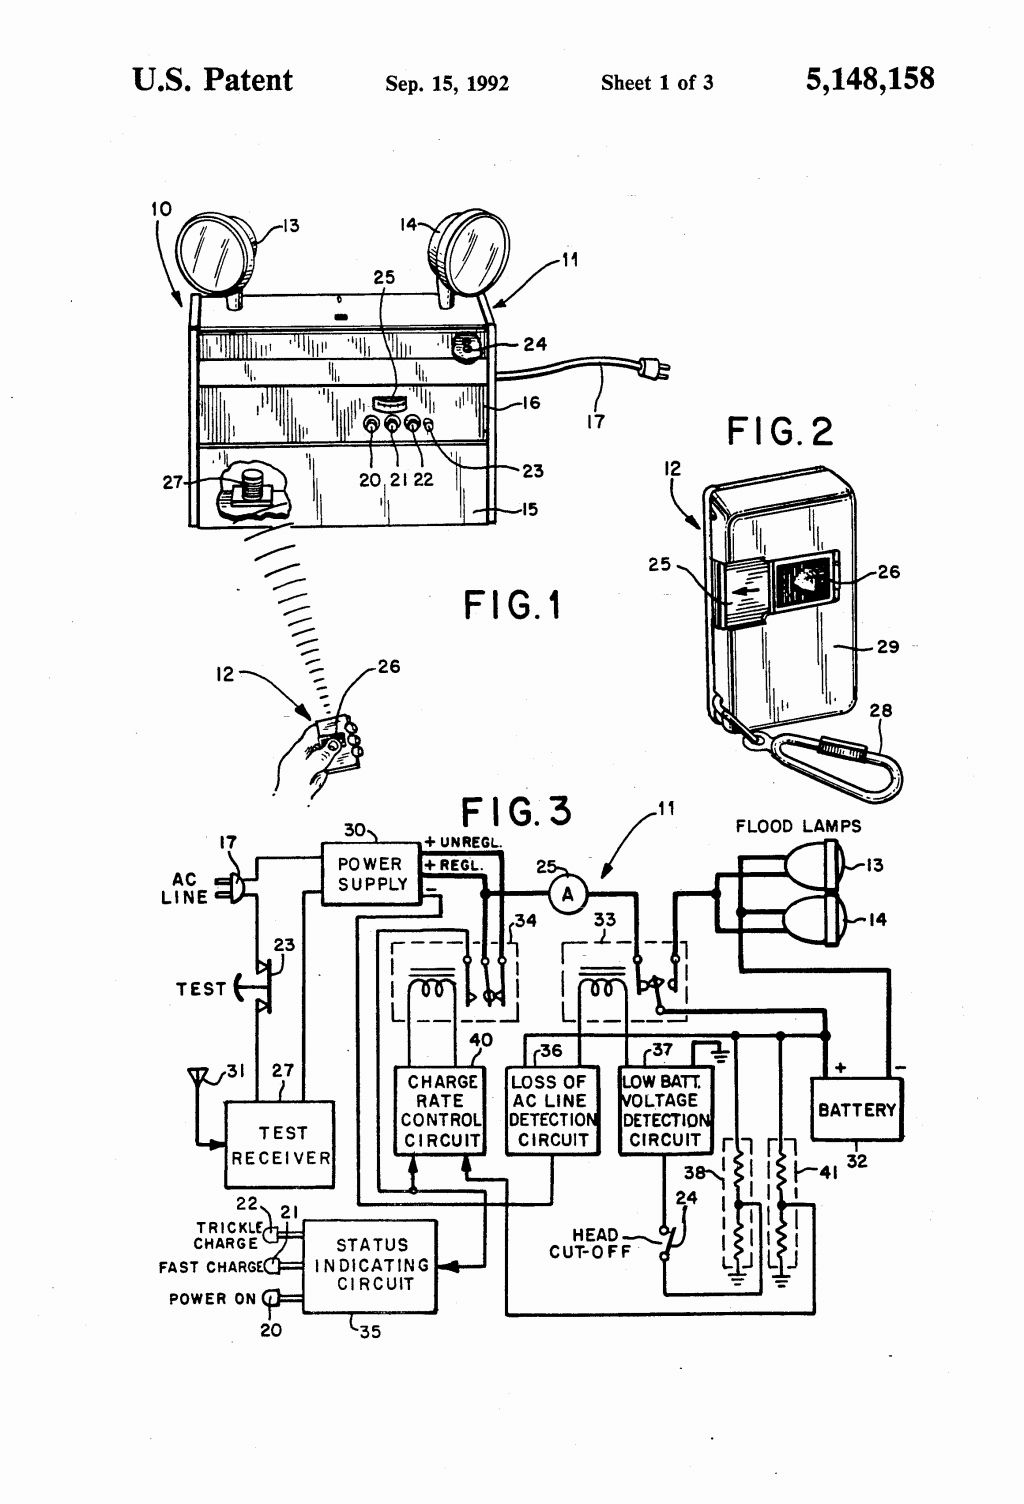 iota i 80 emergency ballast wiring diagram